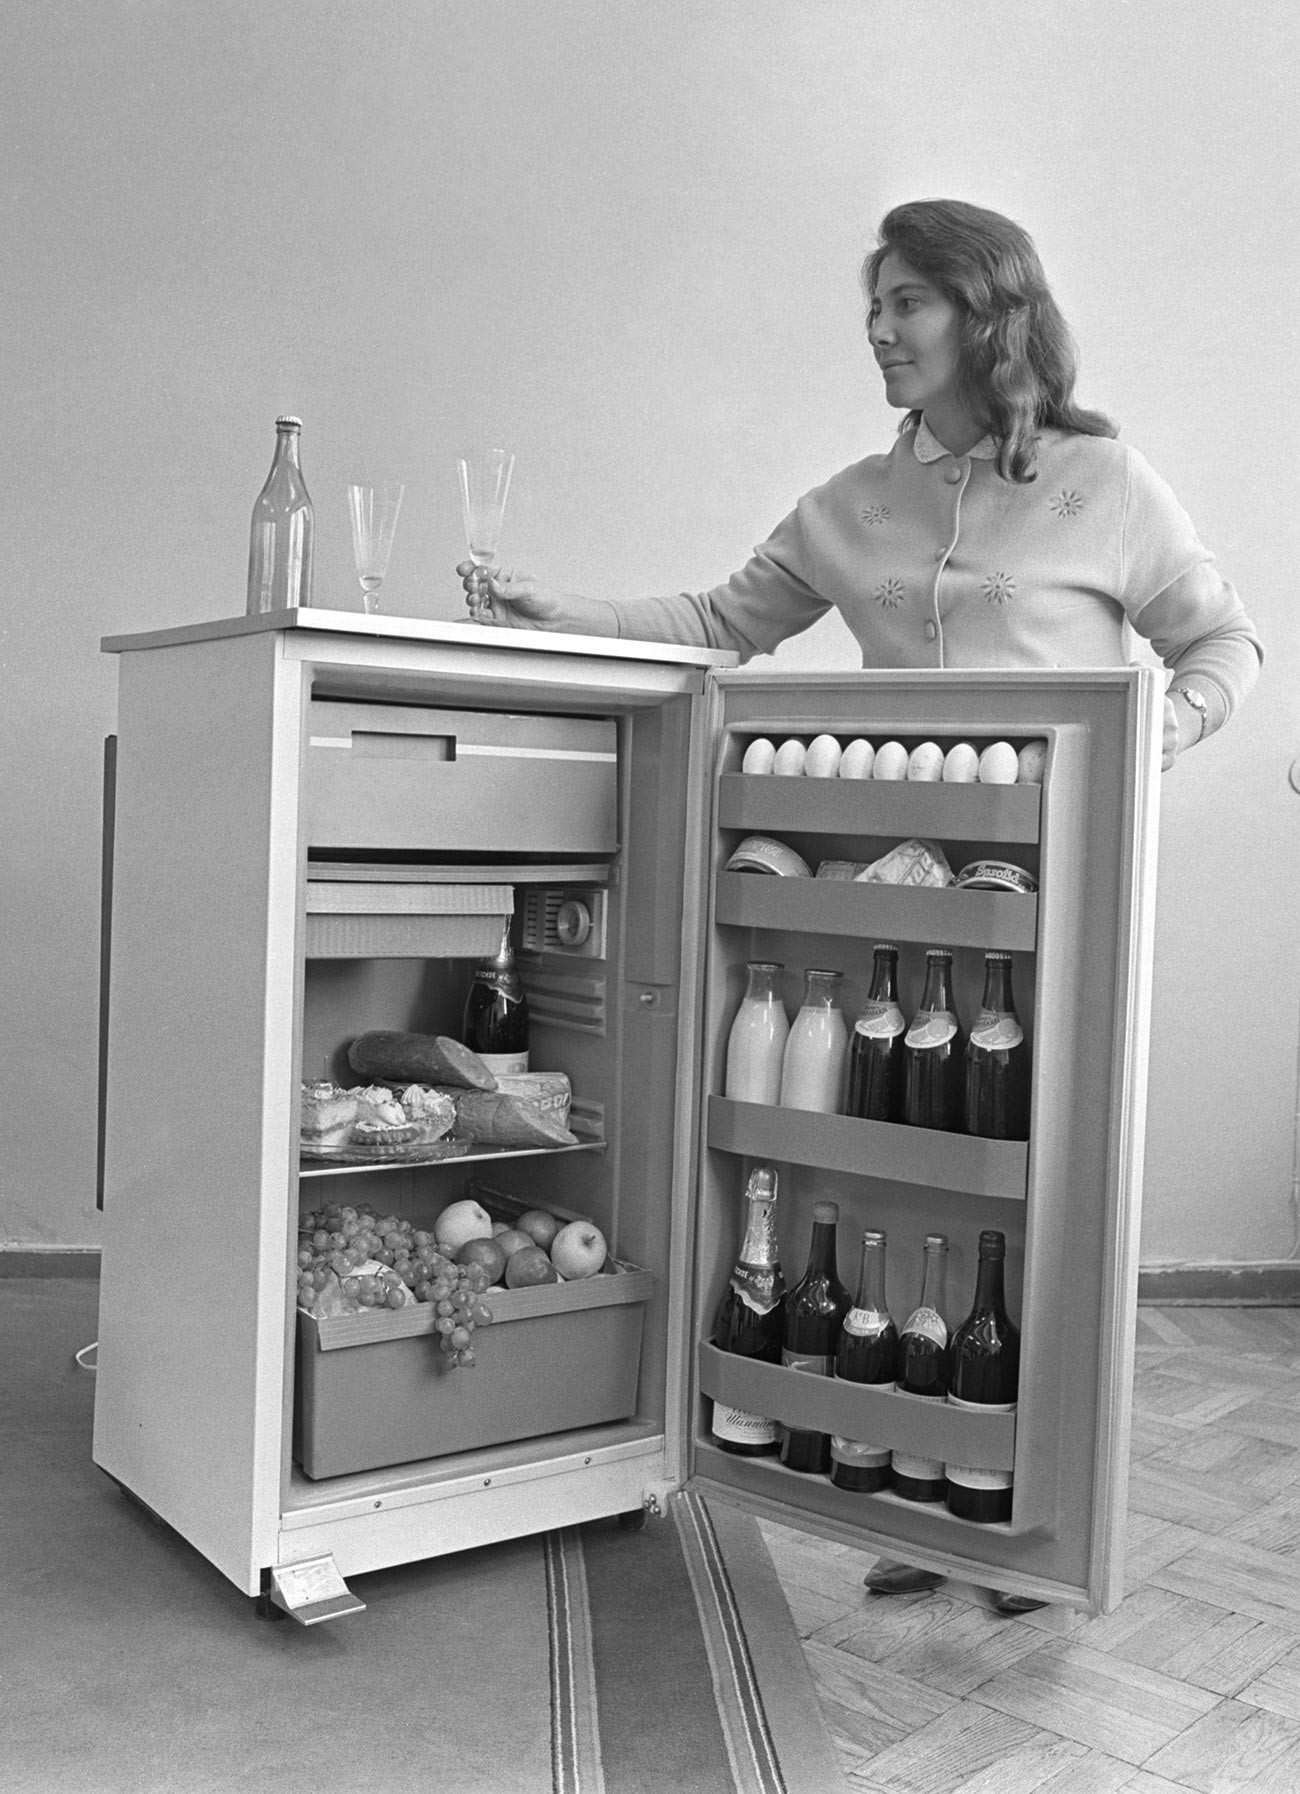 Кишиневски хладилен завод, 1970 г.